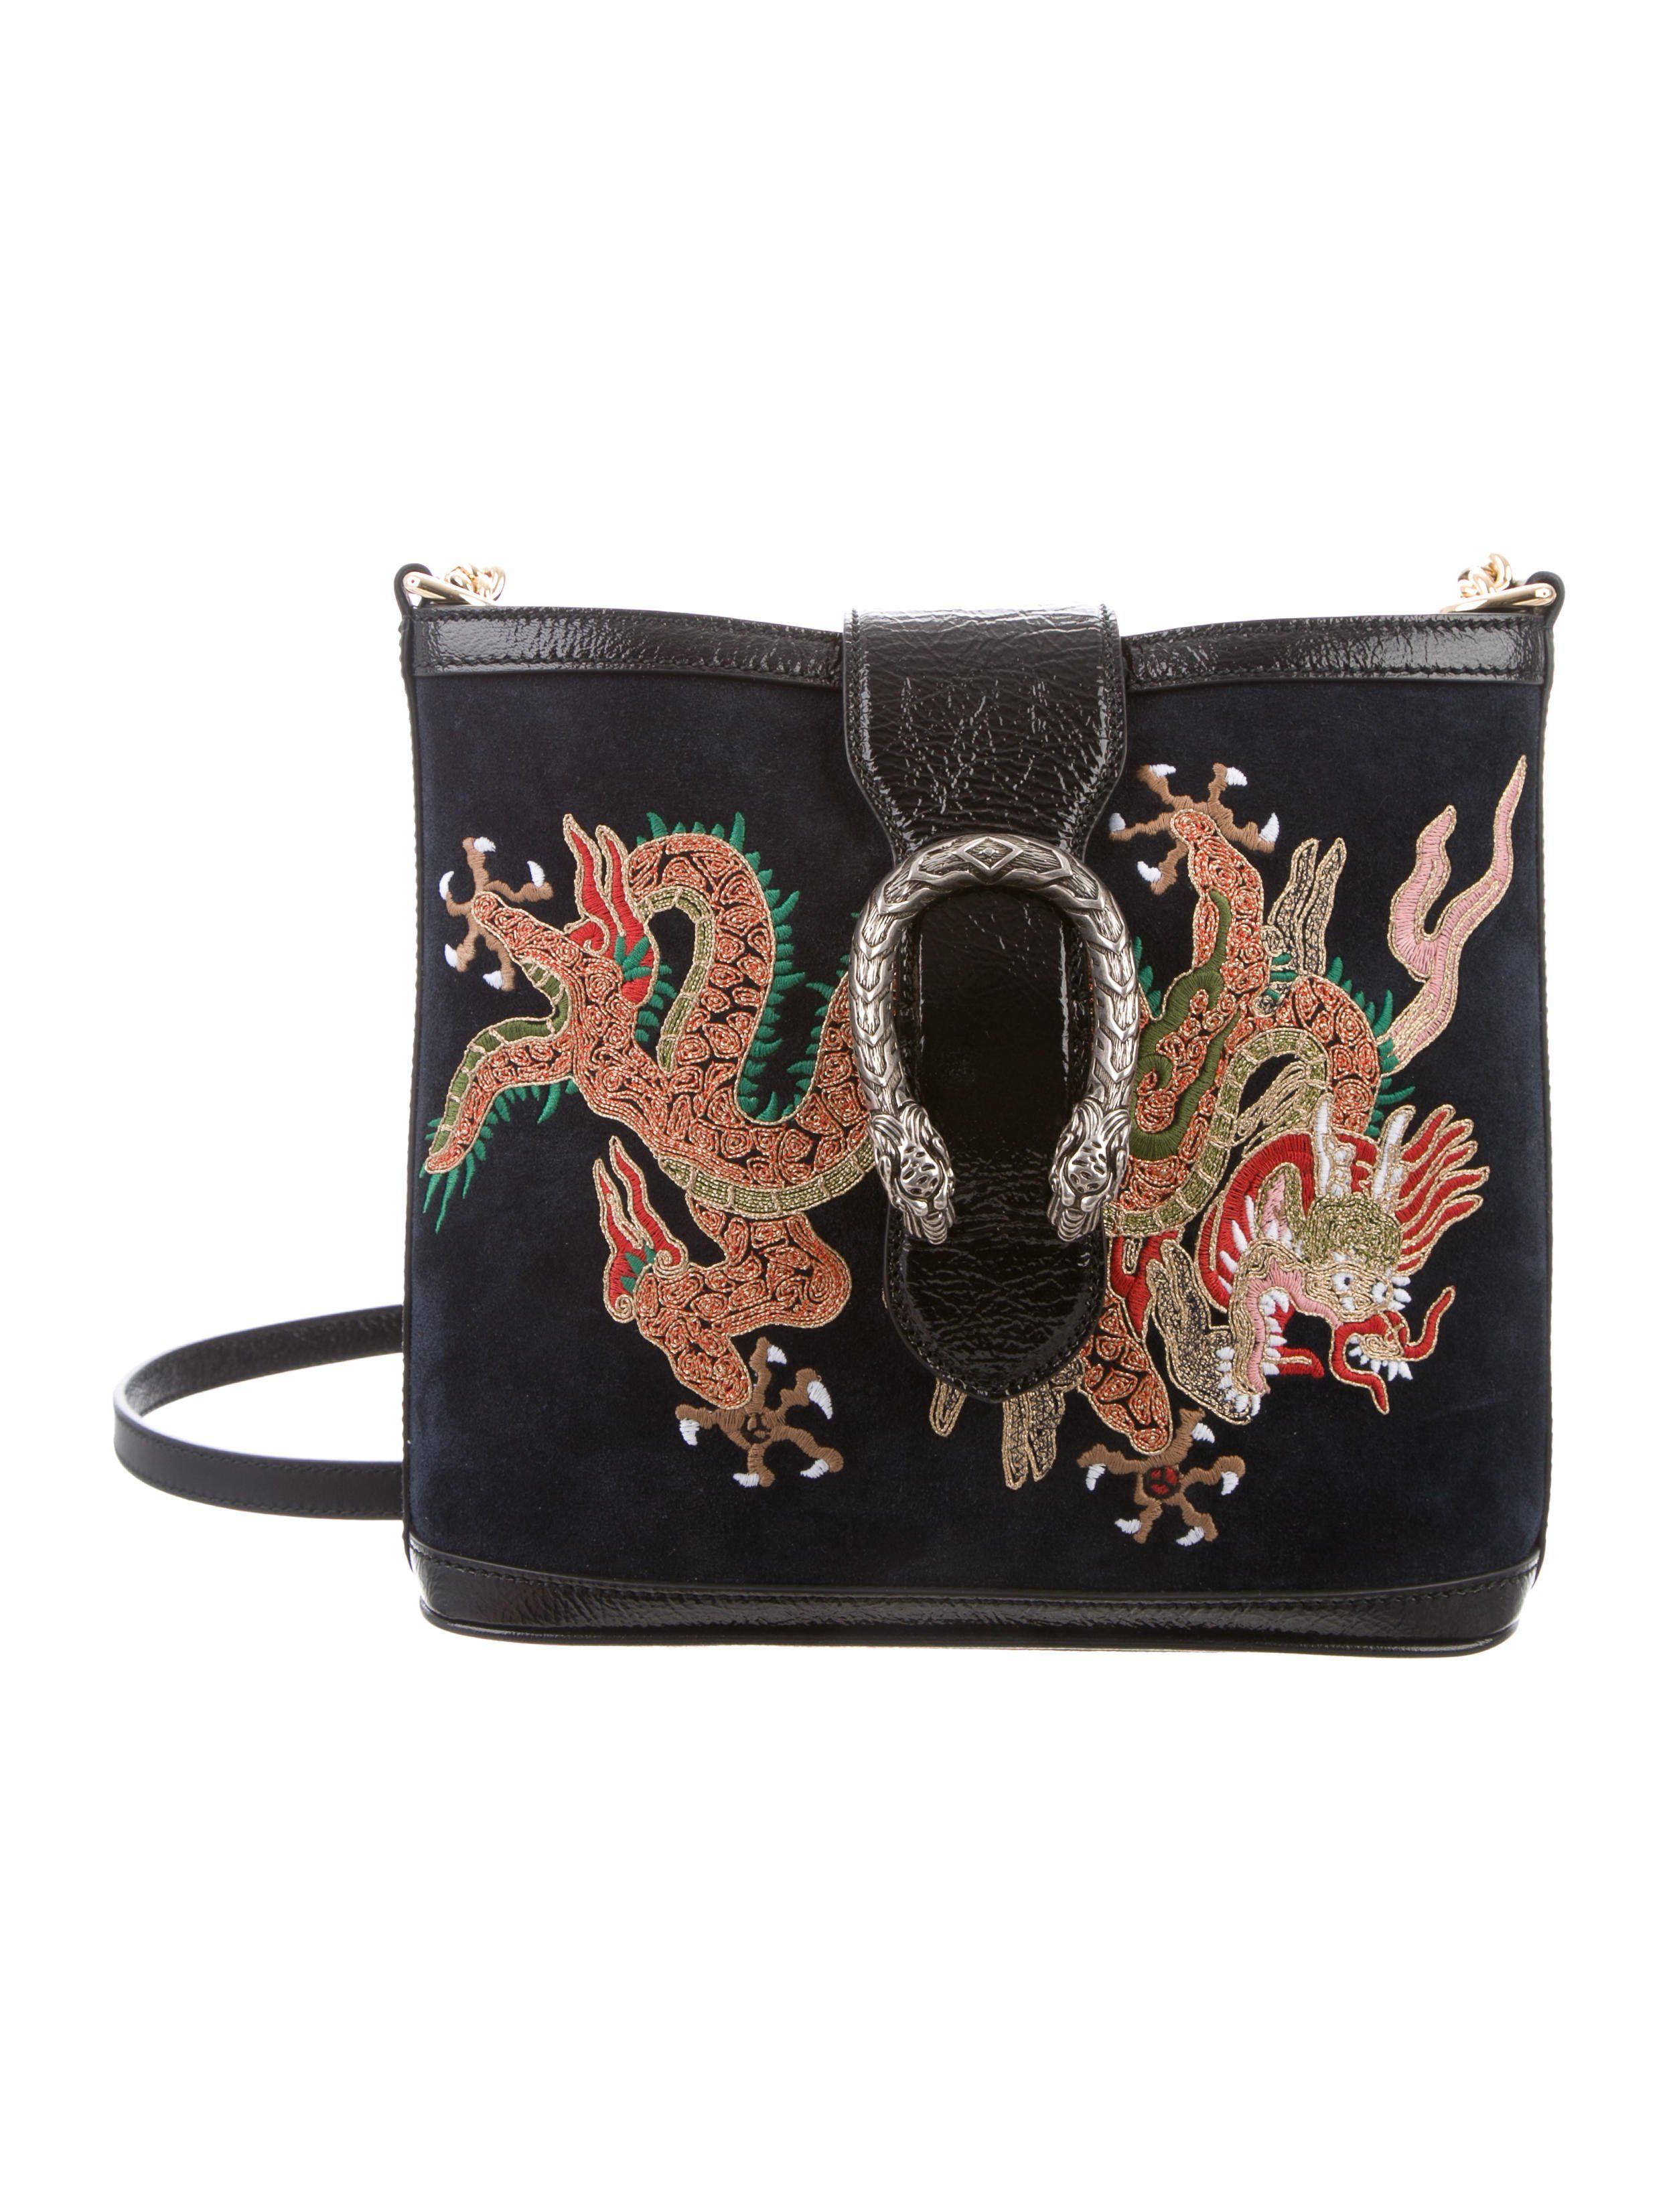 d3fae2e9859 Gucci 2018 Suede Dragon Embroidered Dionysus Bucket Bag - Handbags -  GUC198671